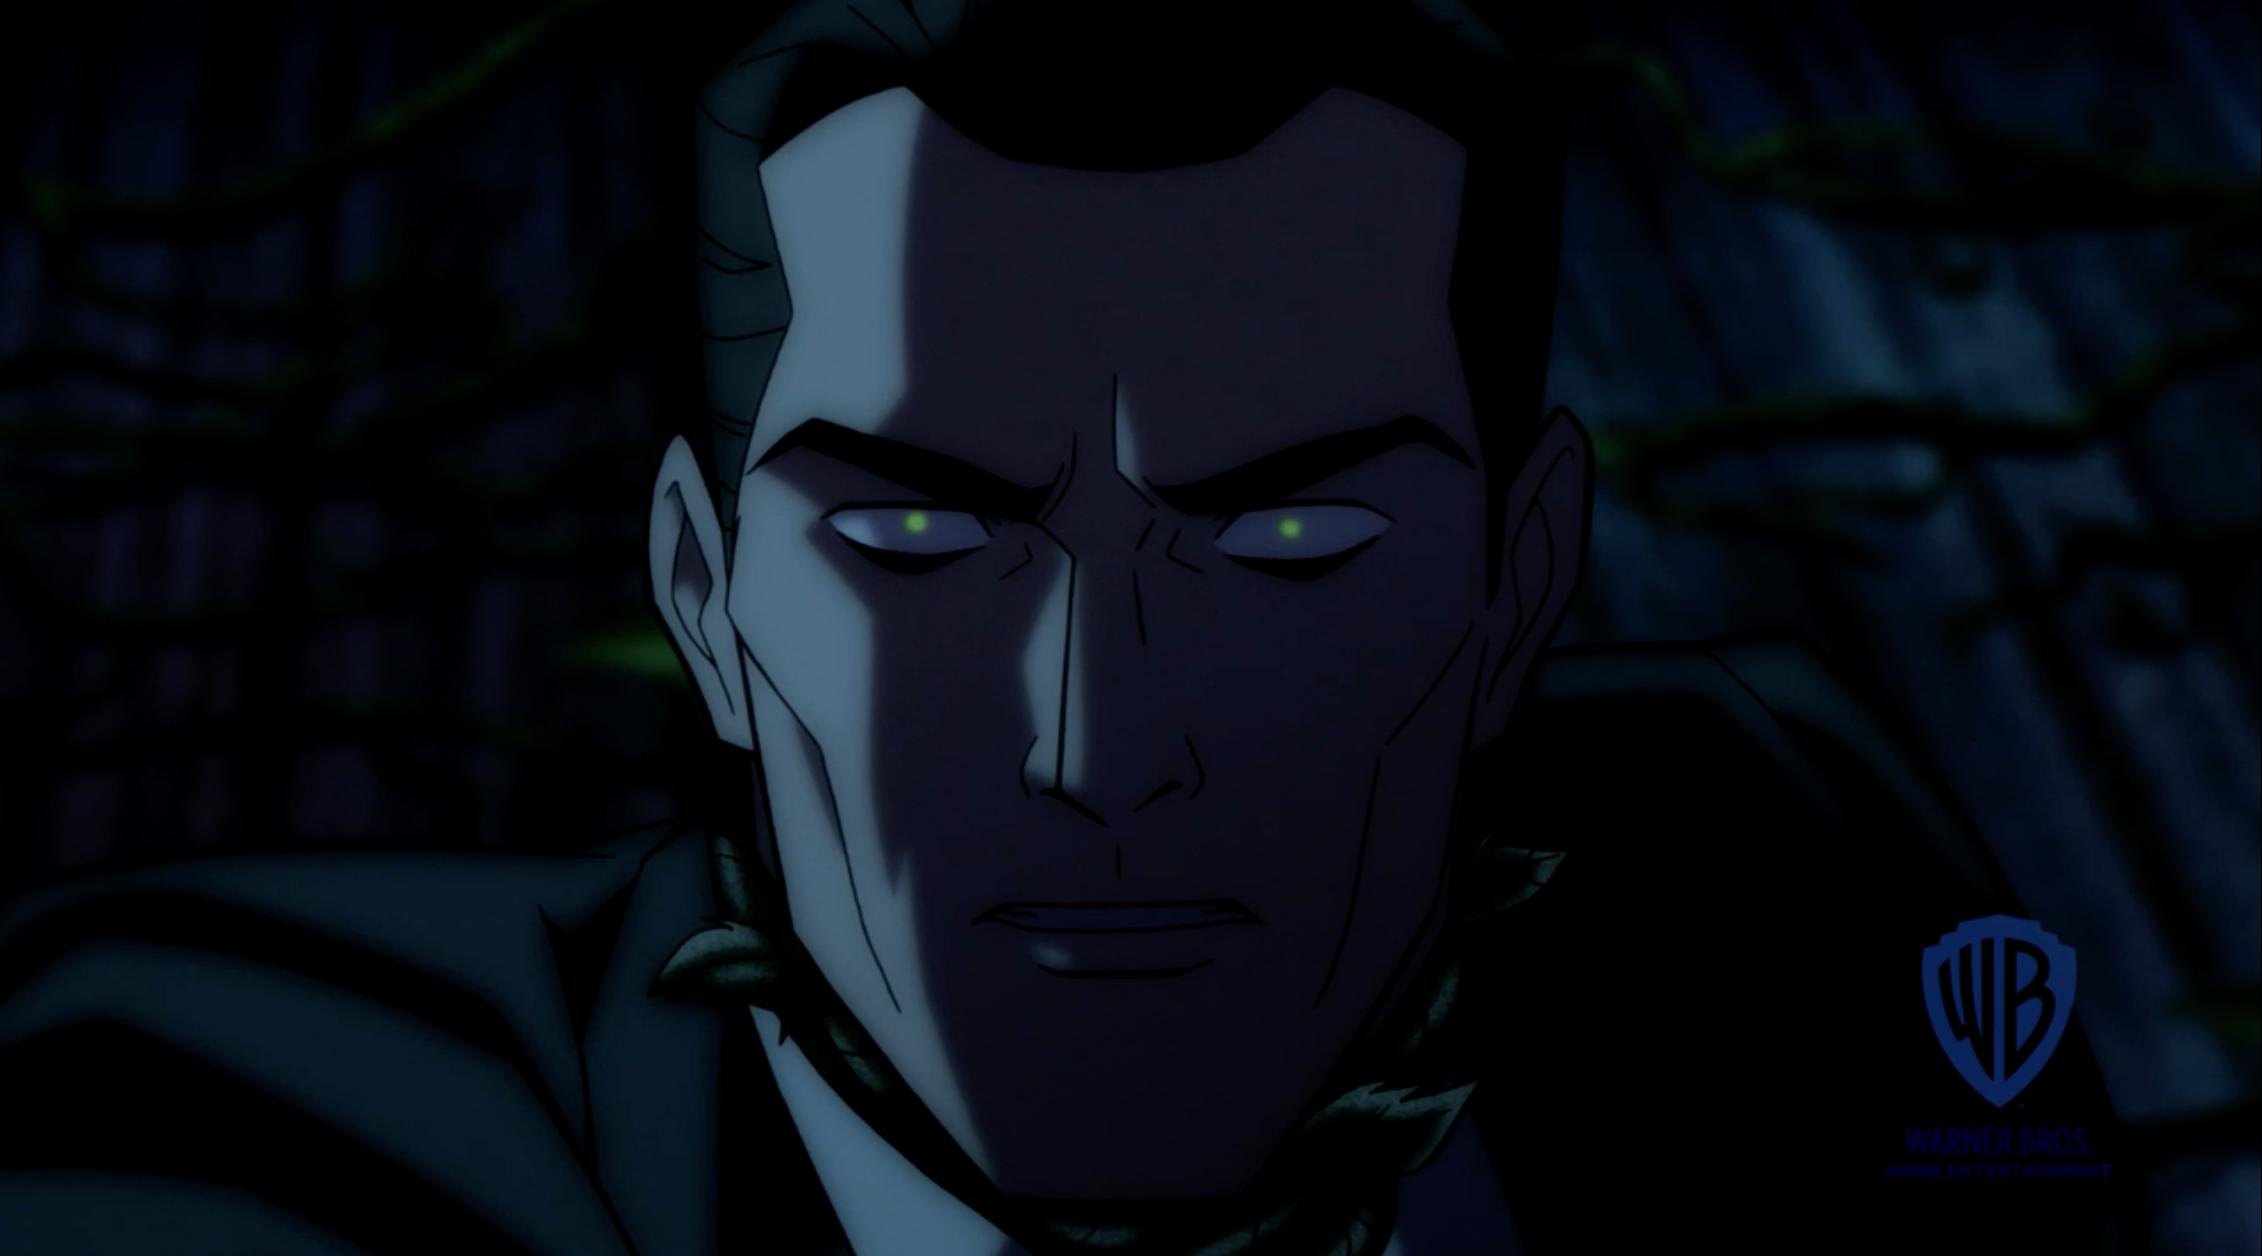 Watch: Bruce Wayne brawls with Catwoman in sneak peek at 'Batman: The Long Halloween, Part Two'